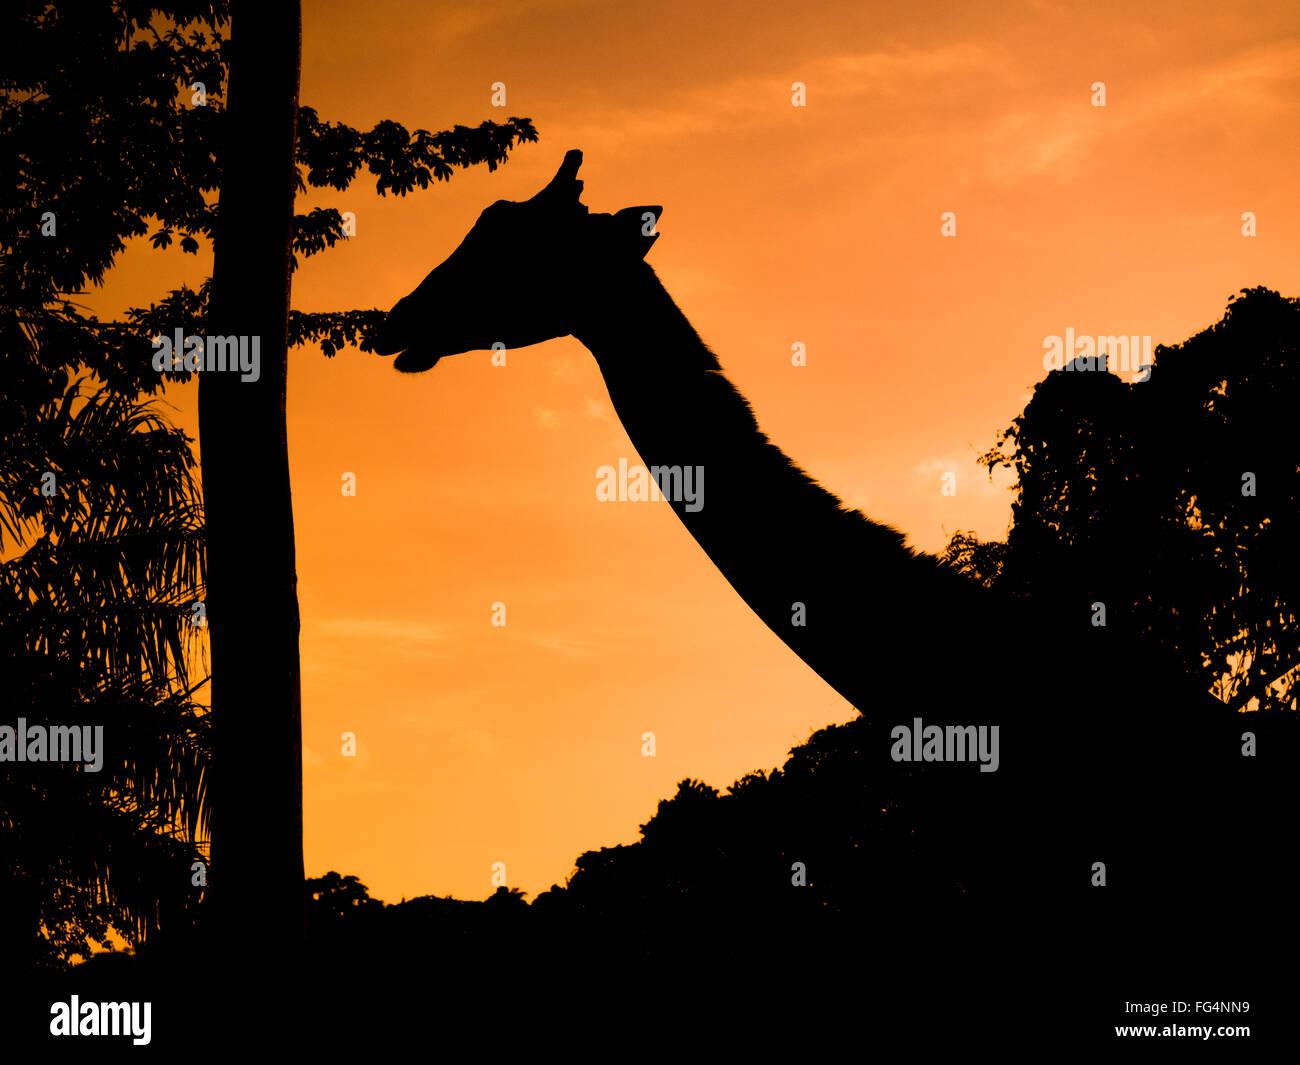 Silhouette Giraffe In Forest Against Orange Sky During Sunset - Stock Image